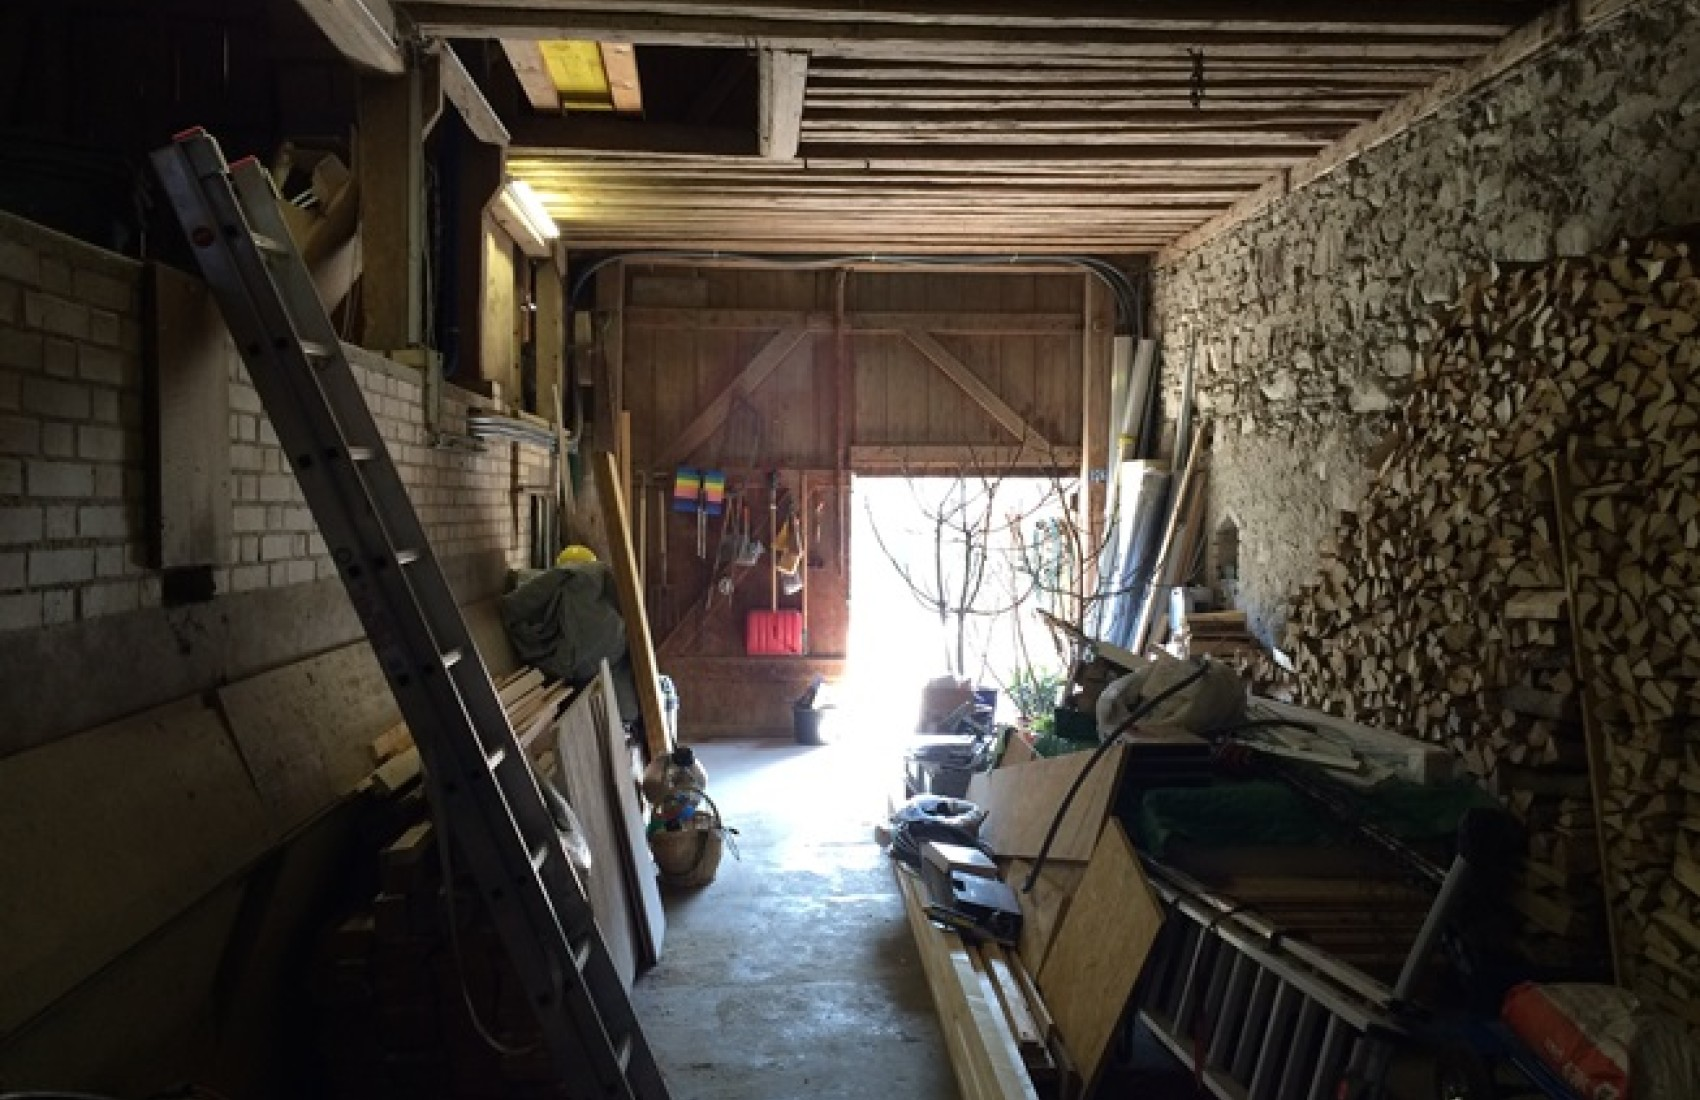 umbau renovation sanierung r timann hoch tiefbau ag baugesch ft hochbau tiefbau. Black Bedroom Furniture Sets. Home Design Ideas